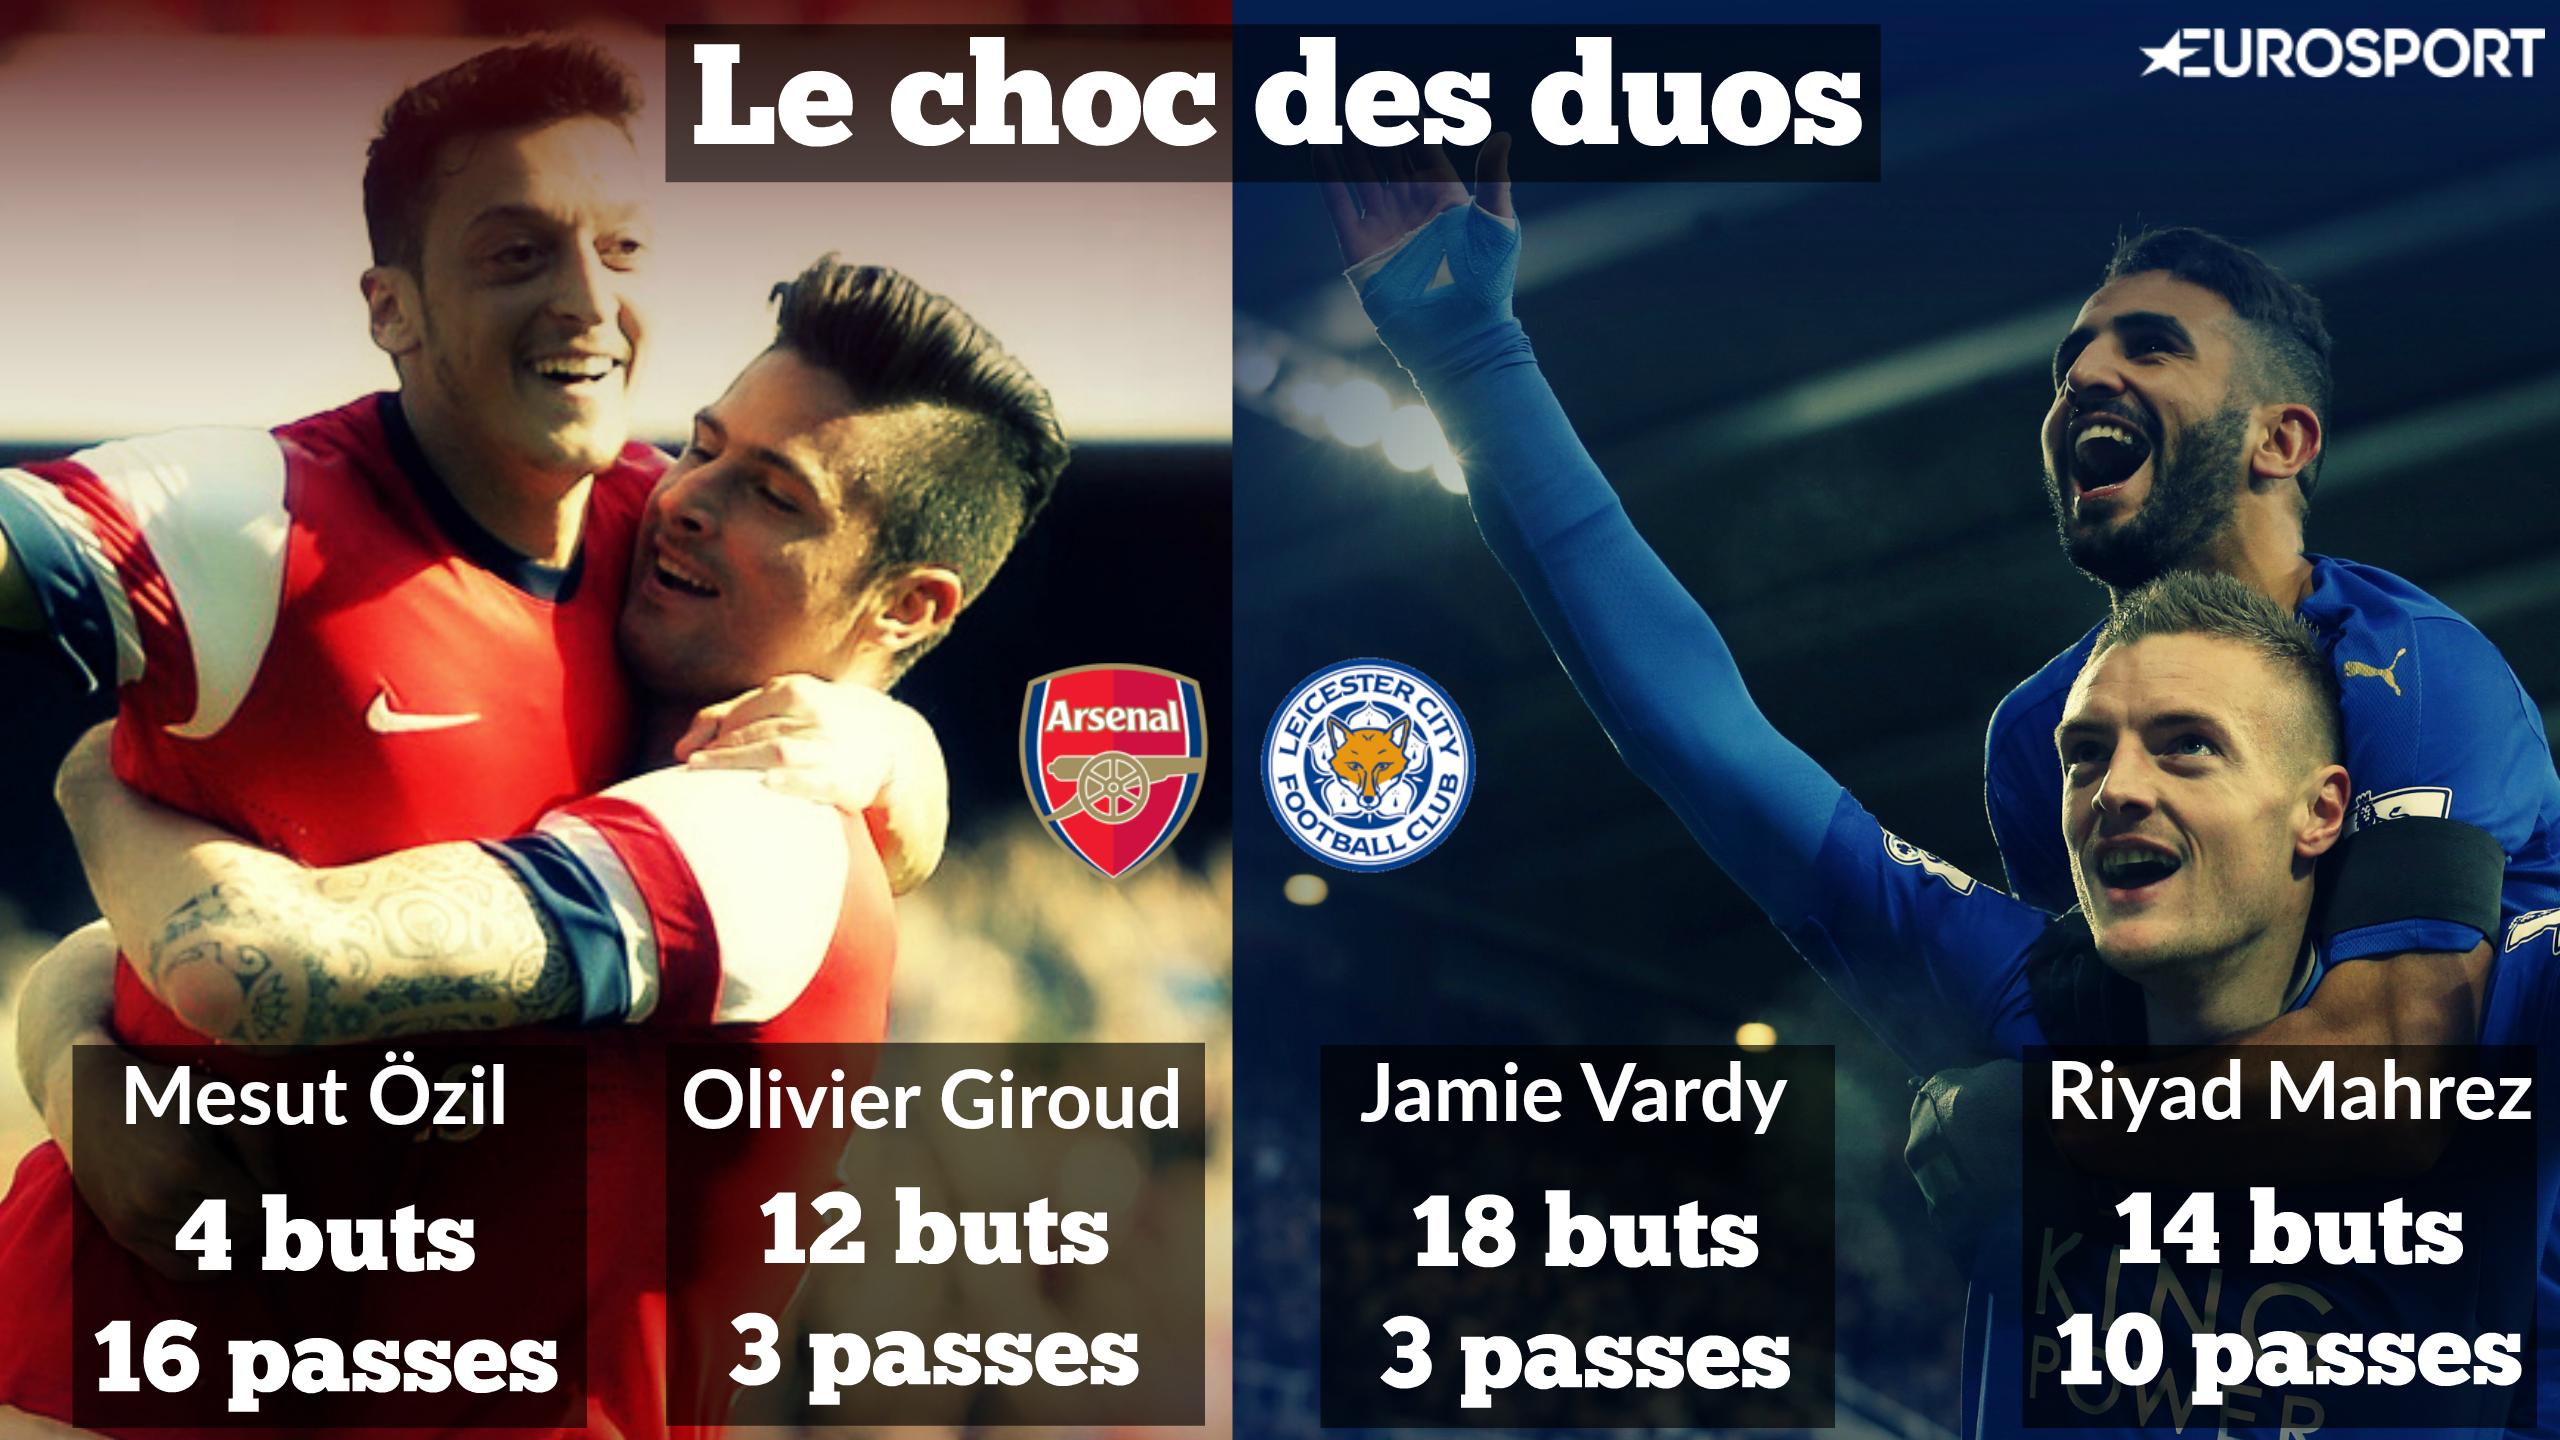 Ozil-Giroud/Vardy-Mahrez